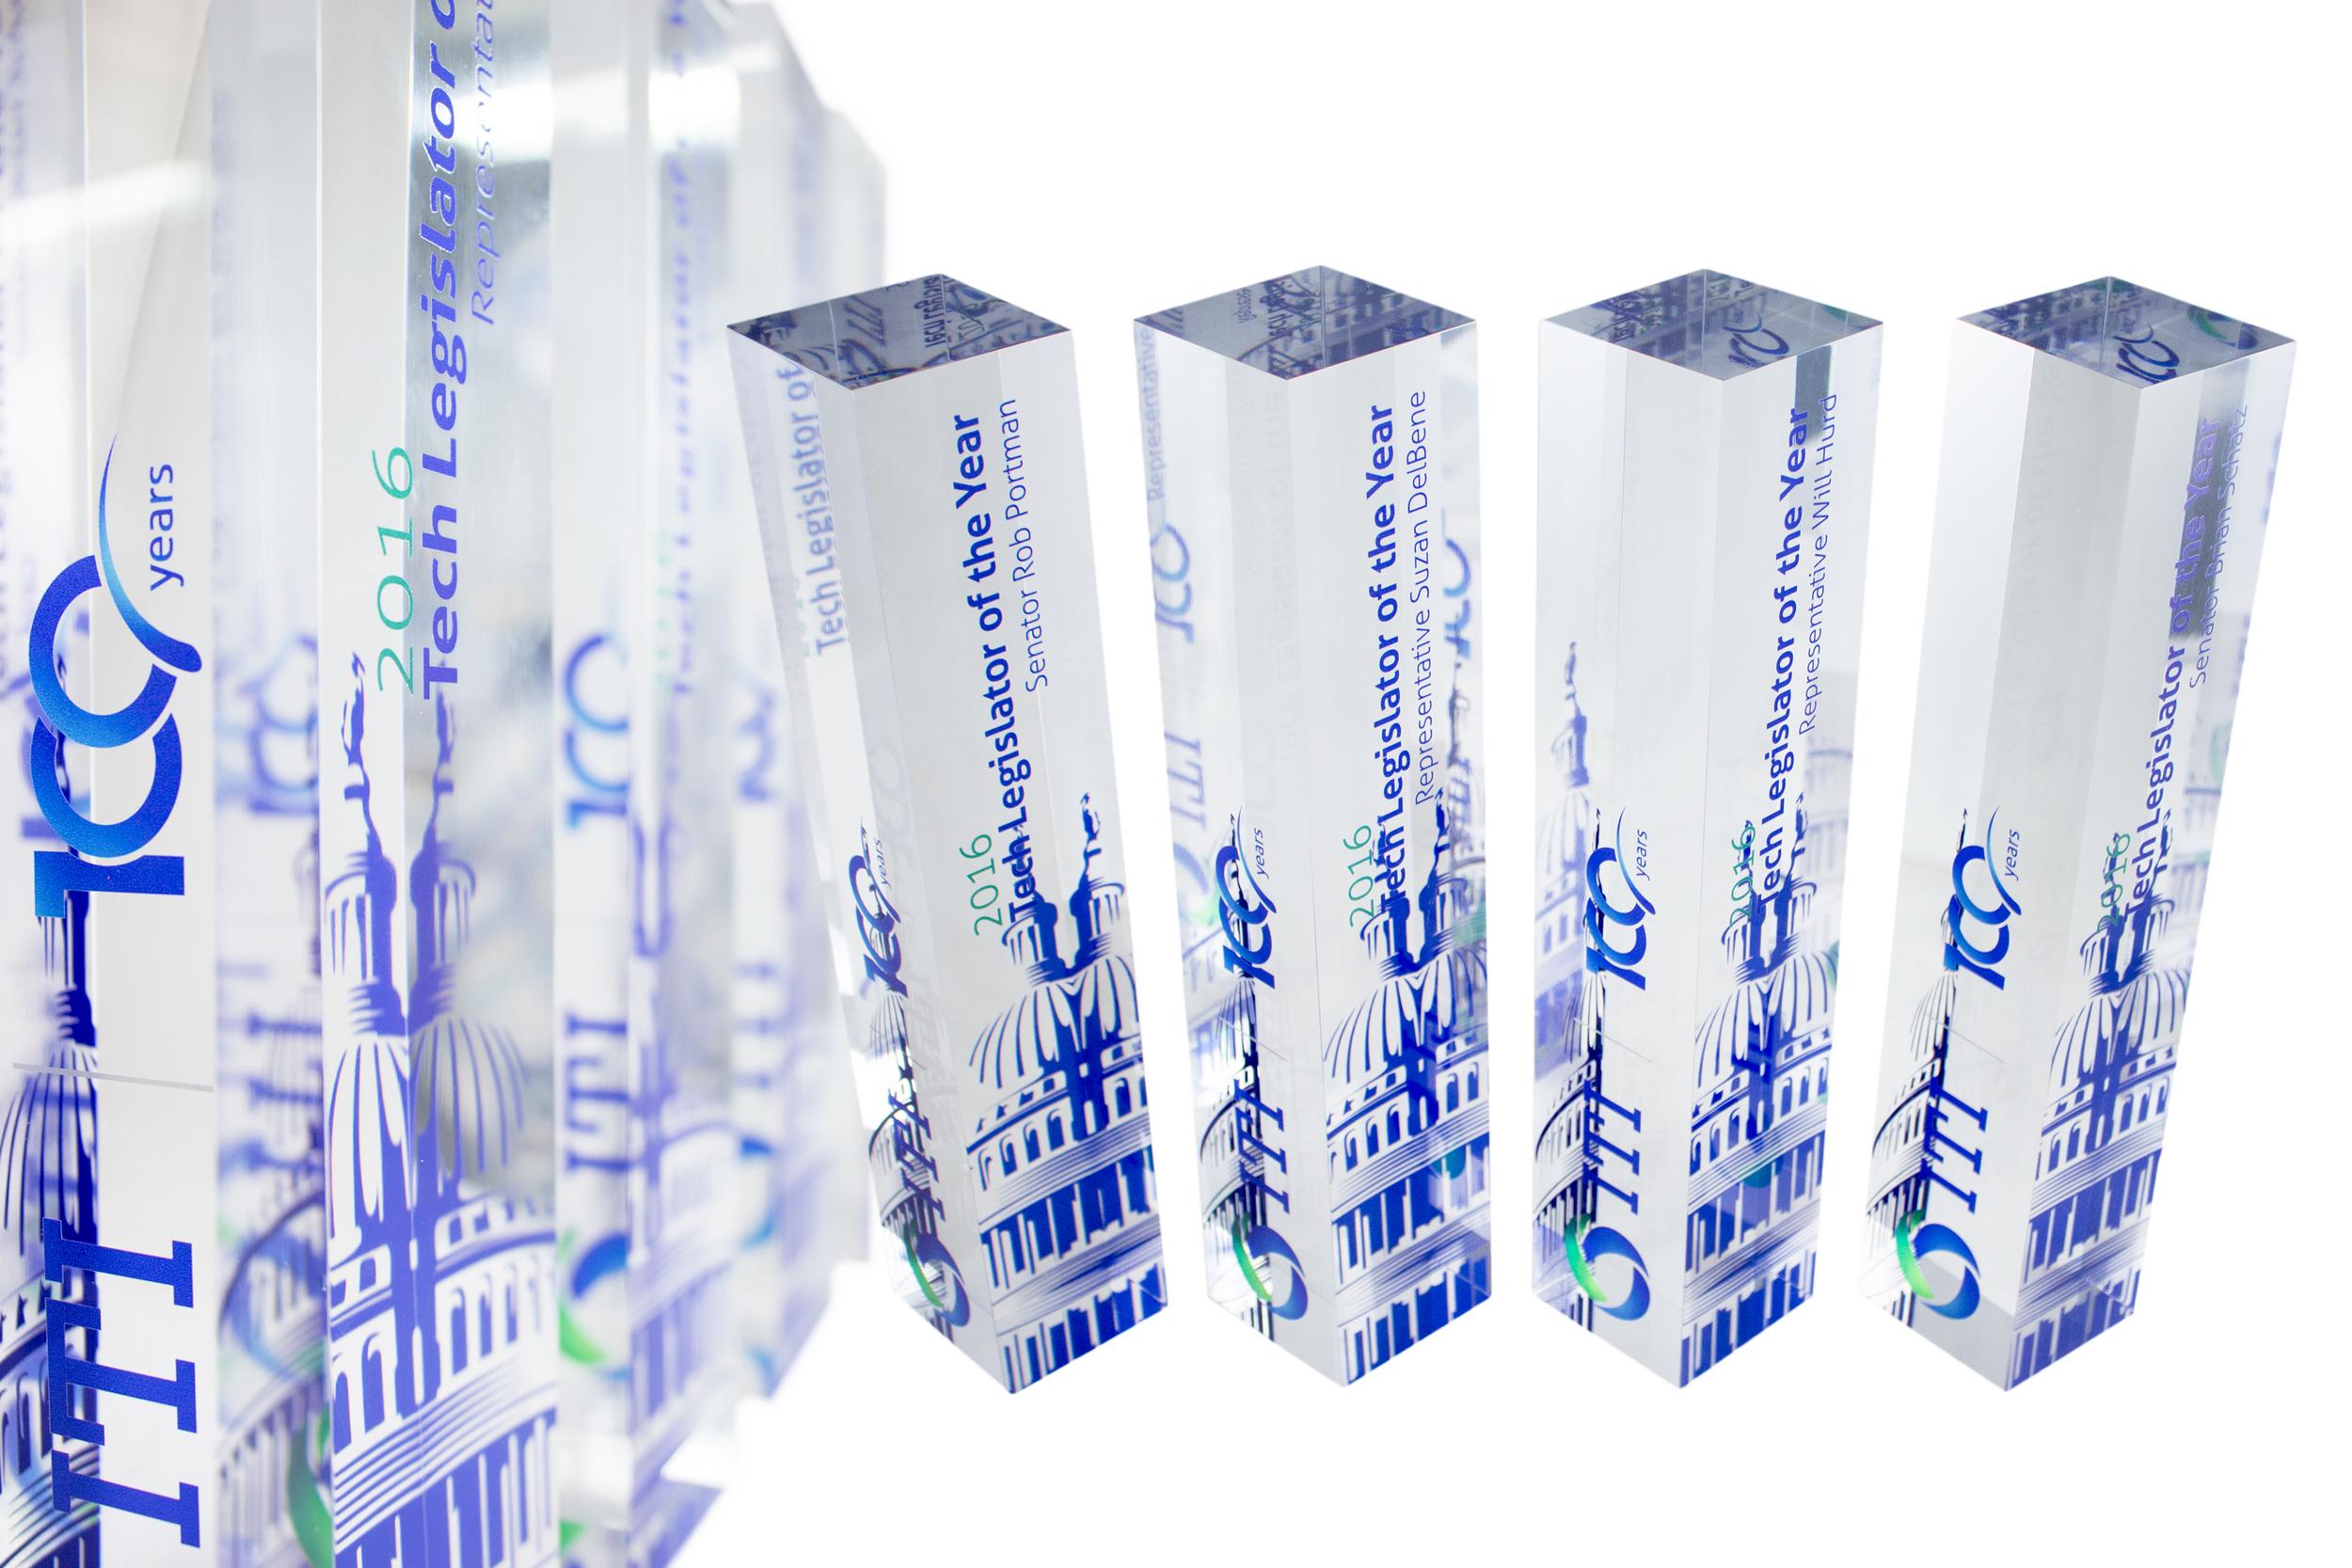 technology leader awards - modern design